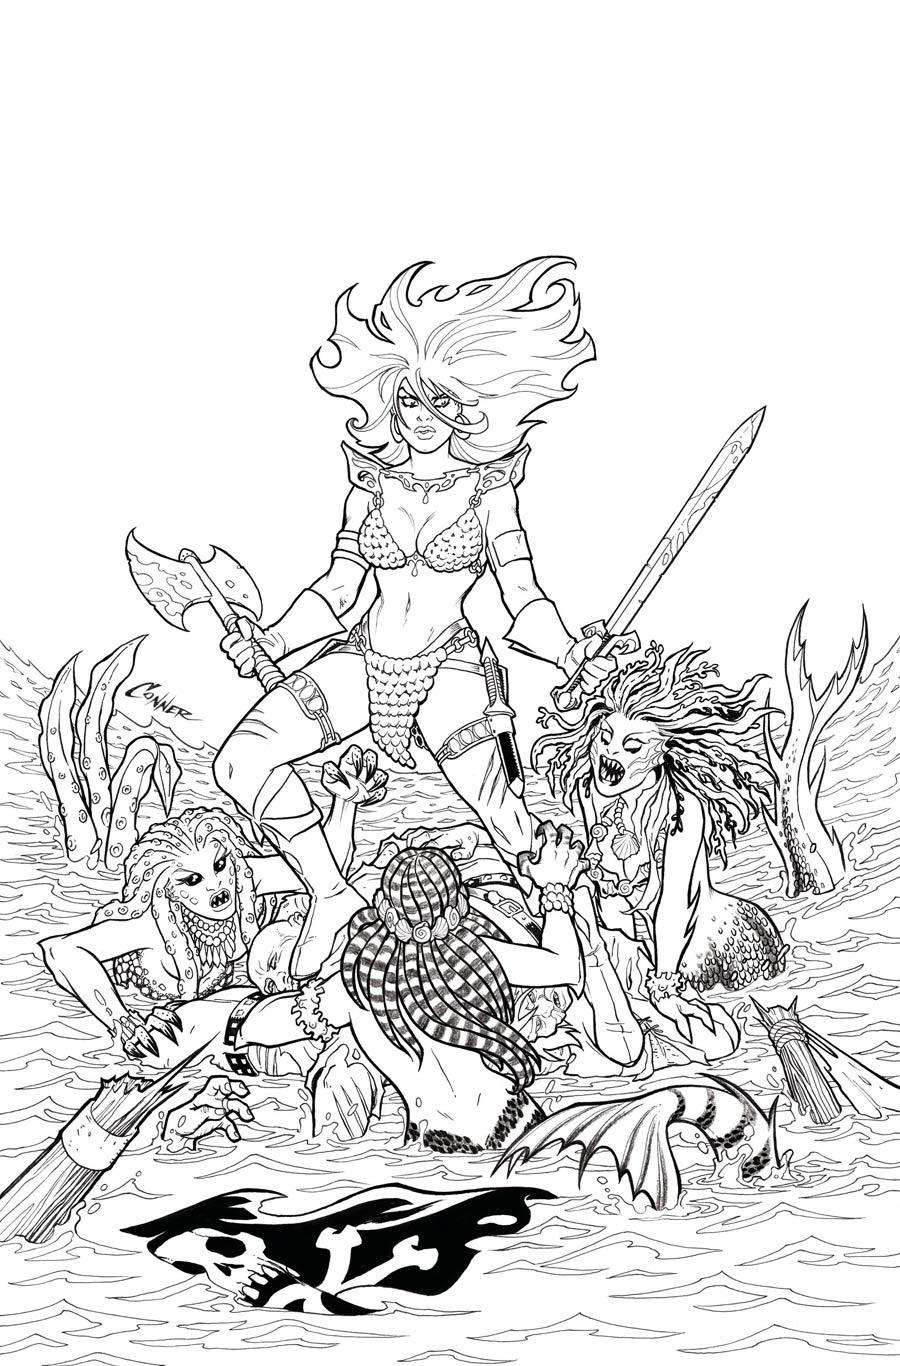 Invincible Red Sonja #1 Cover Q Incentive Amanda Conner Line Art Virgin Cover